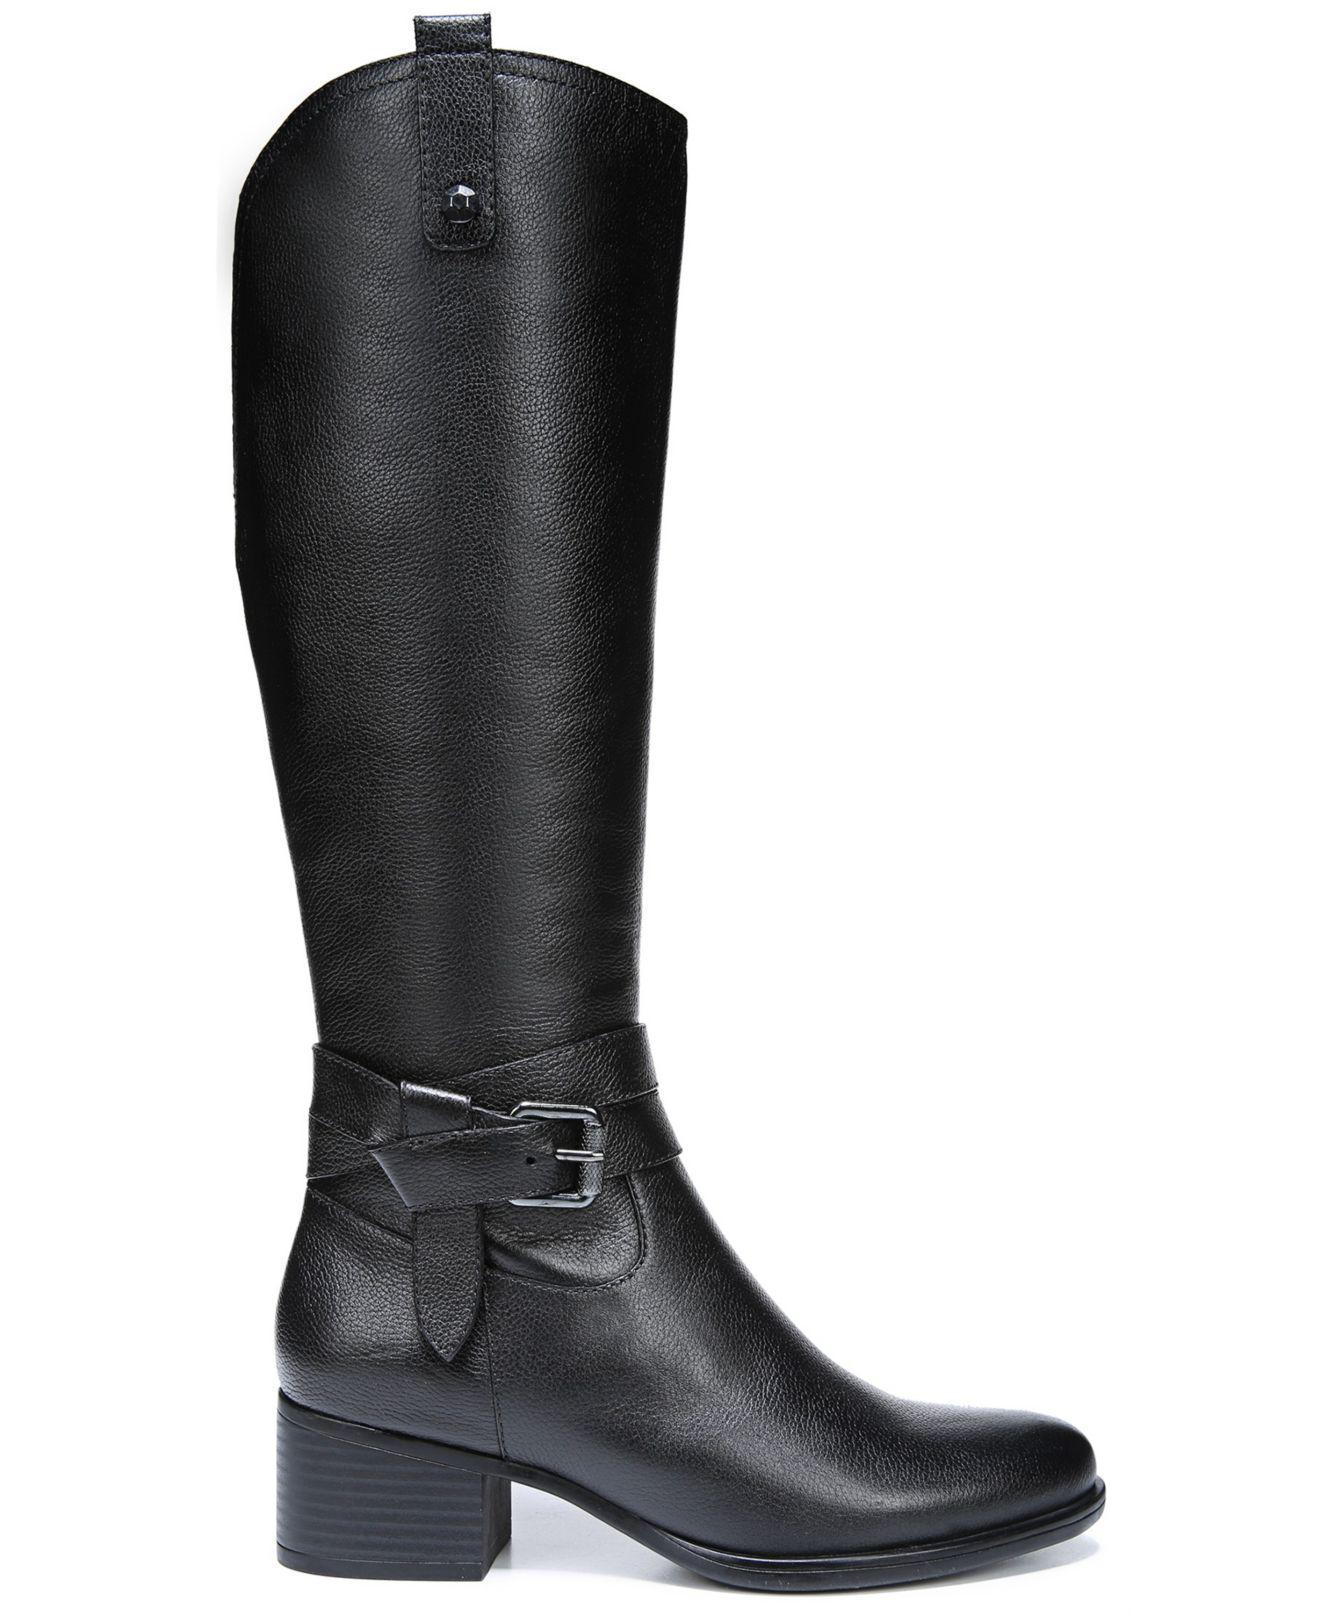 82c28c72e080 Lyst - Naturalizer Kim Wide Calf Riding Boots in Black